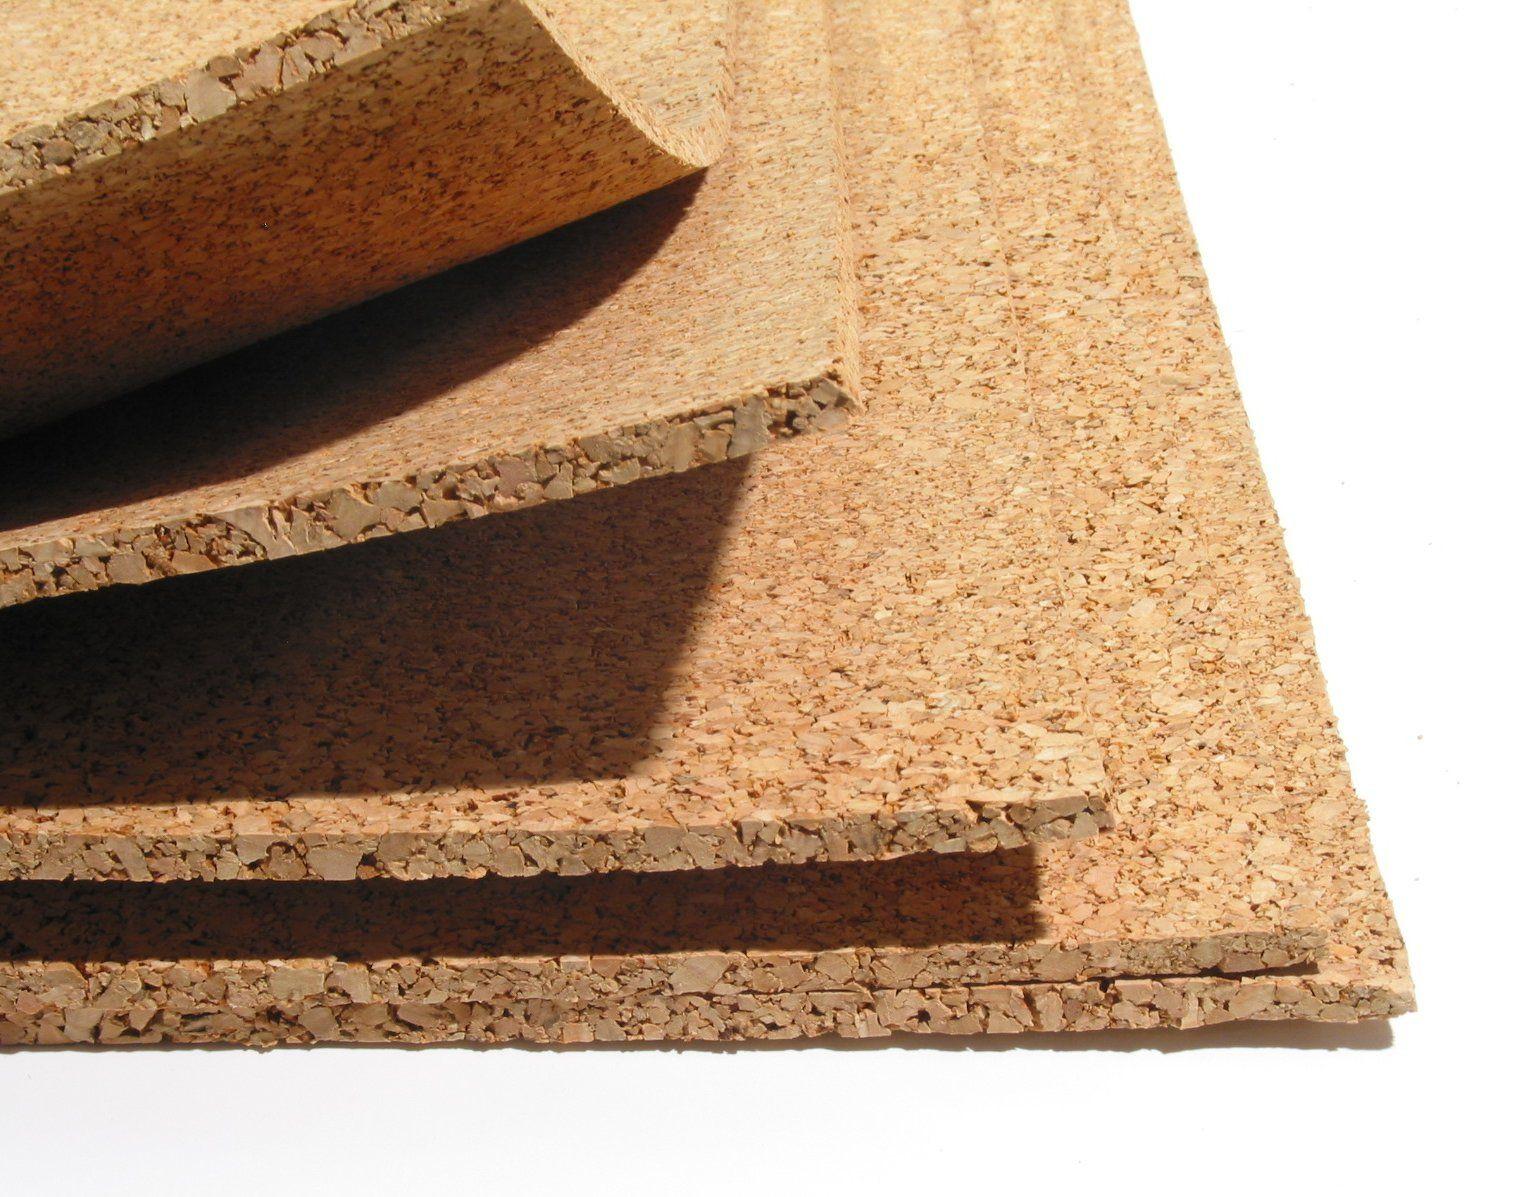 hosking hardwood flooring reviews of all about underlayments inside cork underlayment